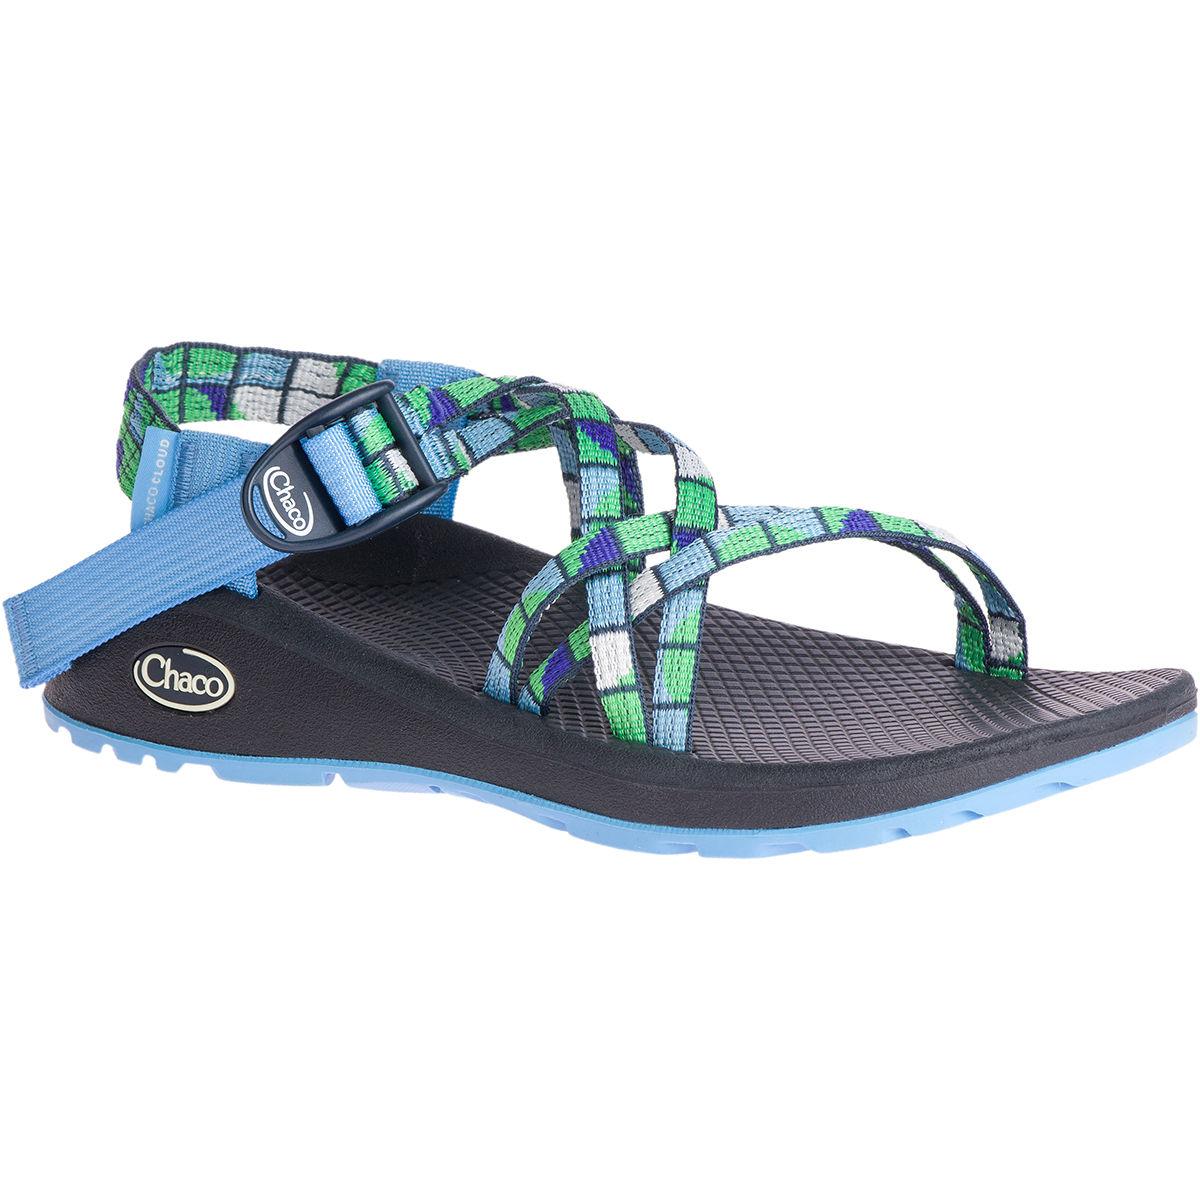 photo: Chaco Women's Zong sport sandal